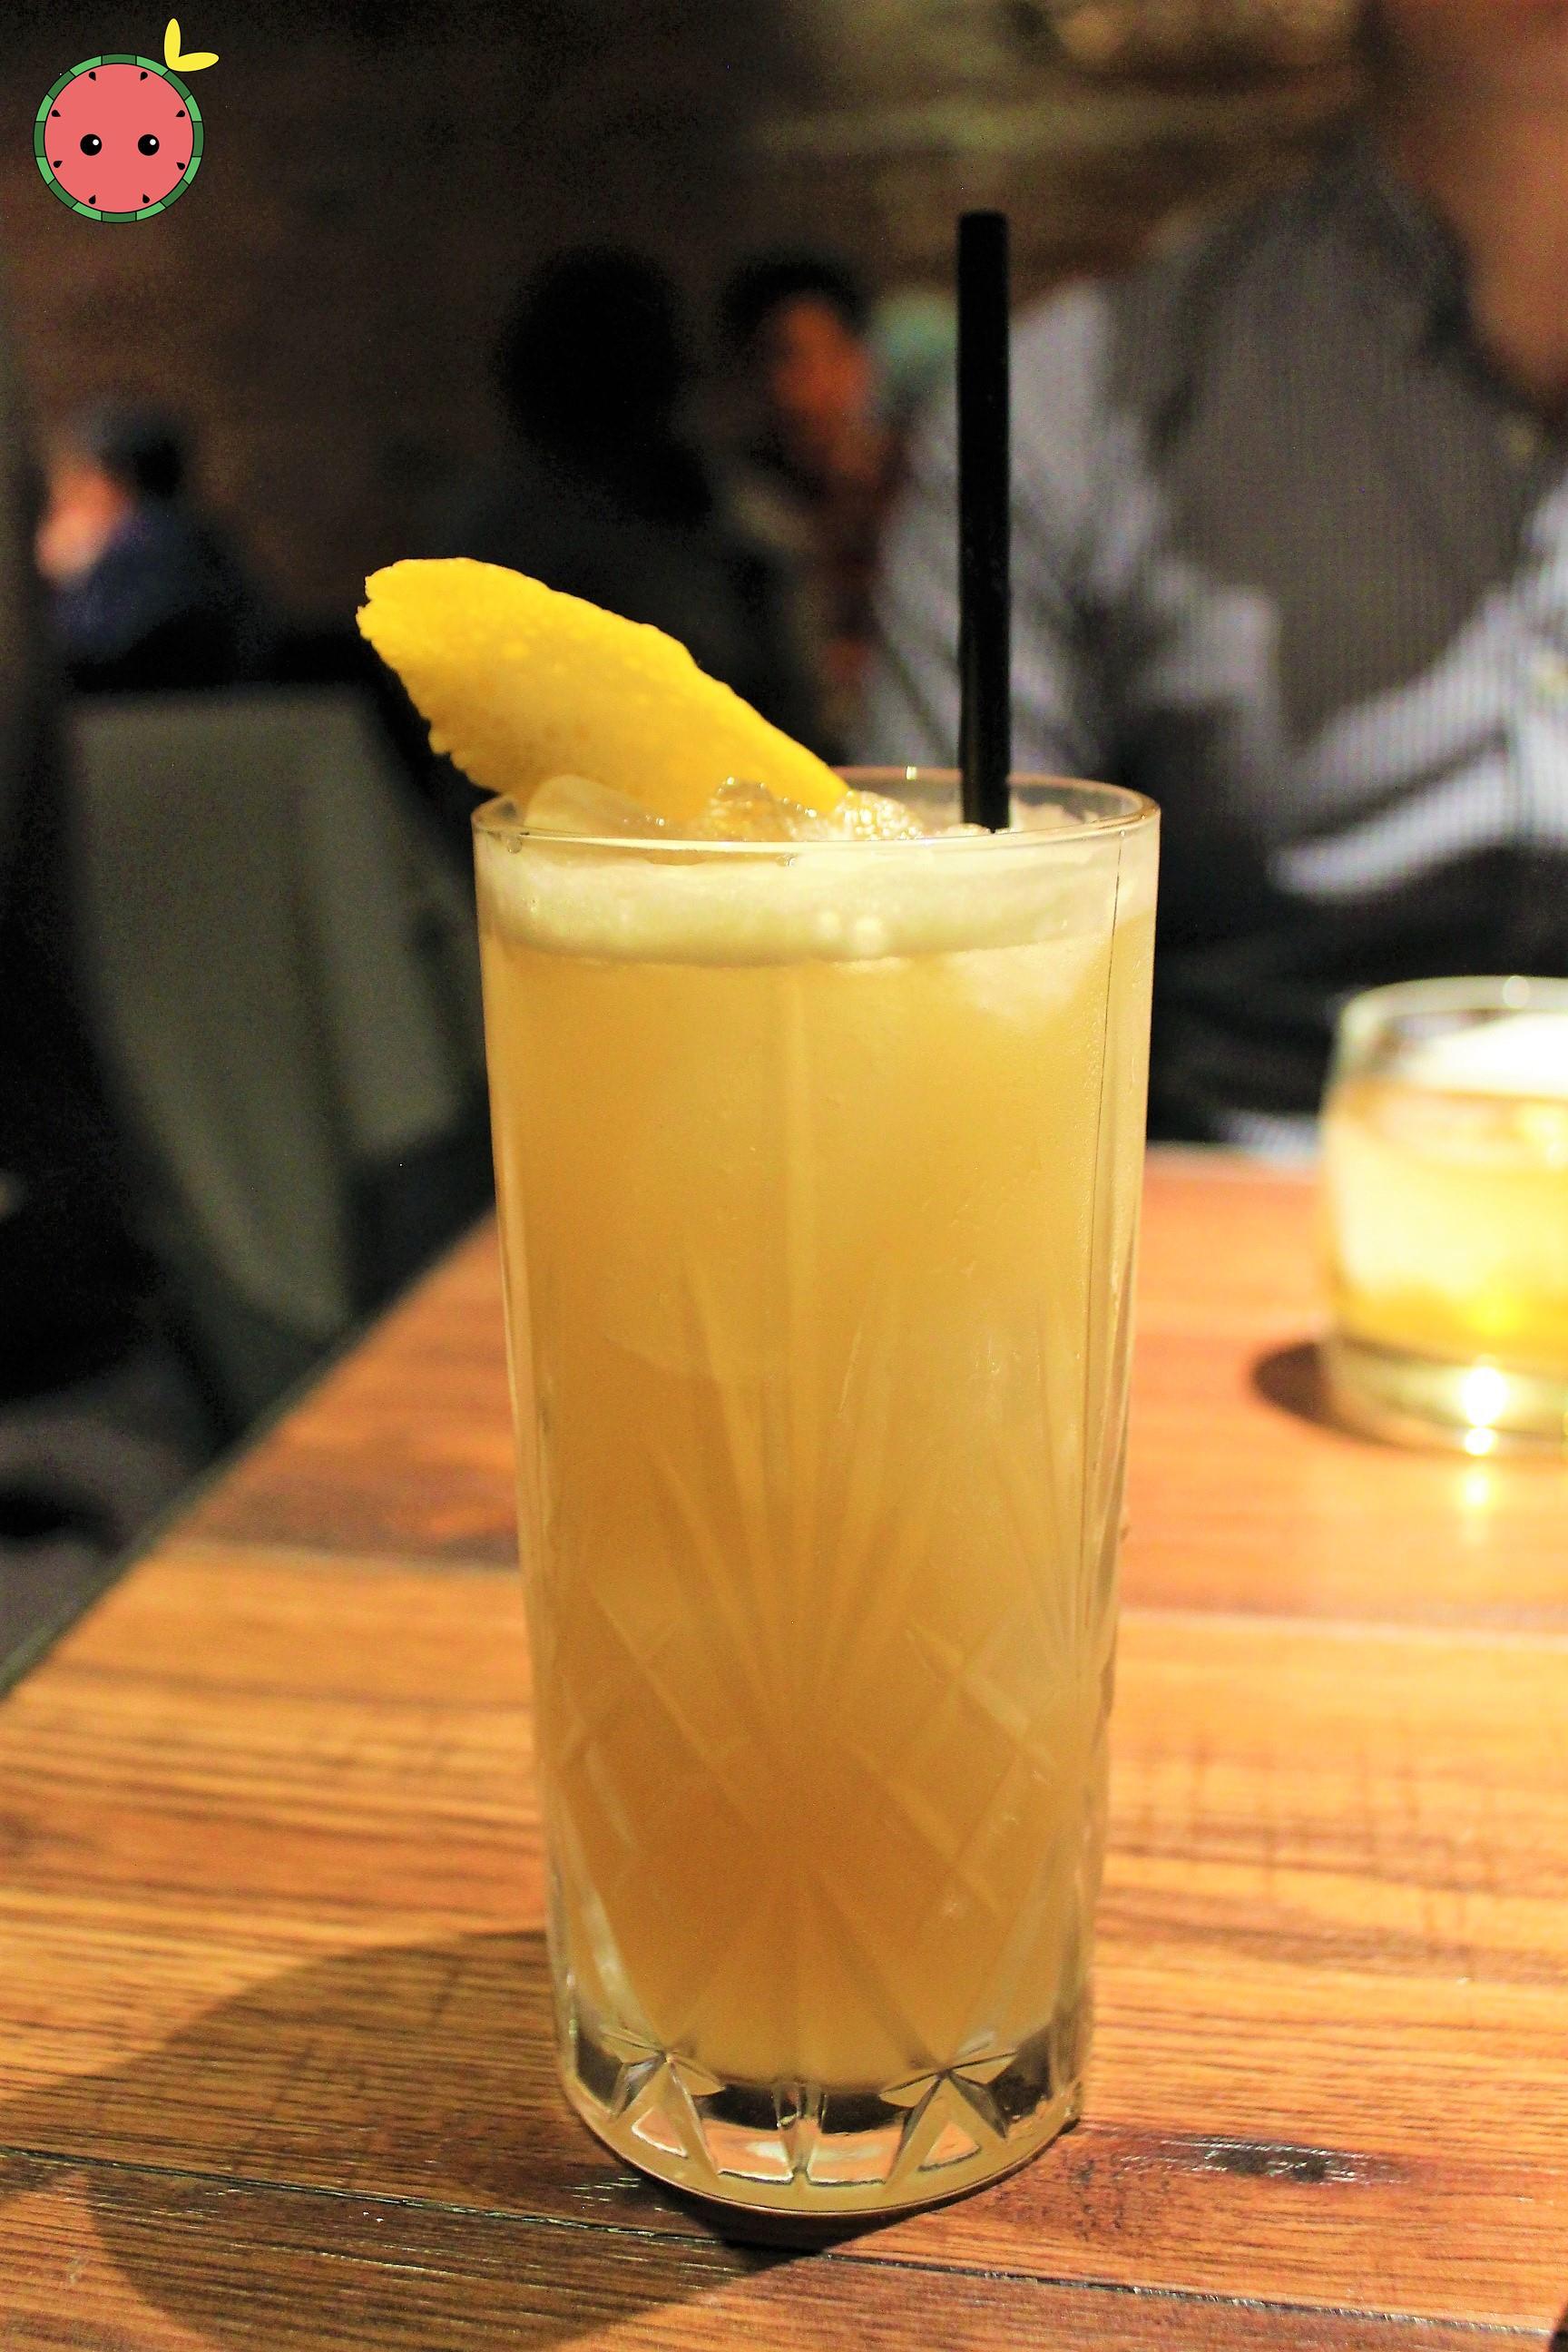 Ginger's Secret (Rye Whiskey, Rhum J.M. VO, Dry Vermouth, Ginger Juice, Demerara Sugar & Lemon)